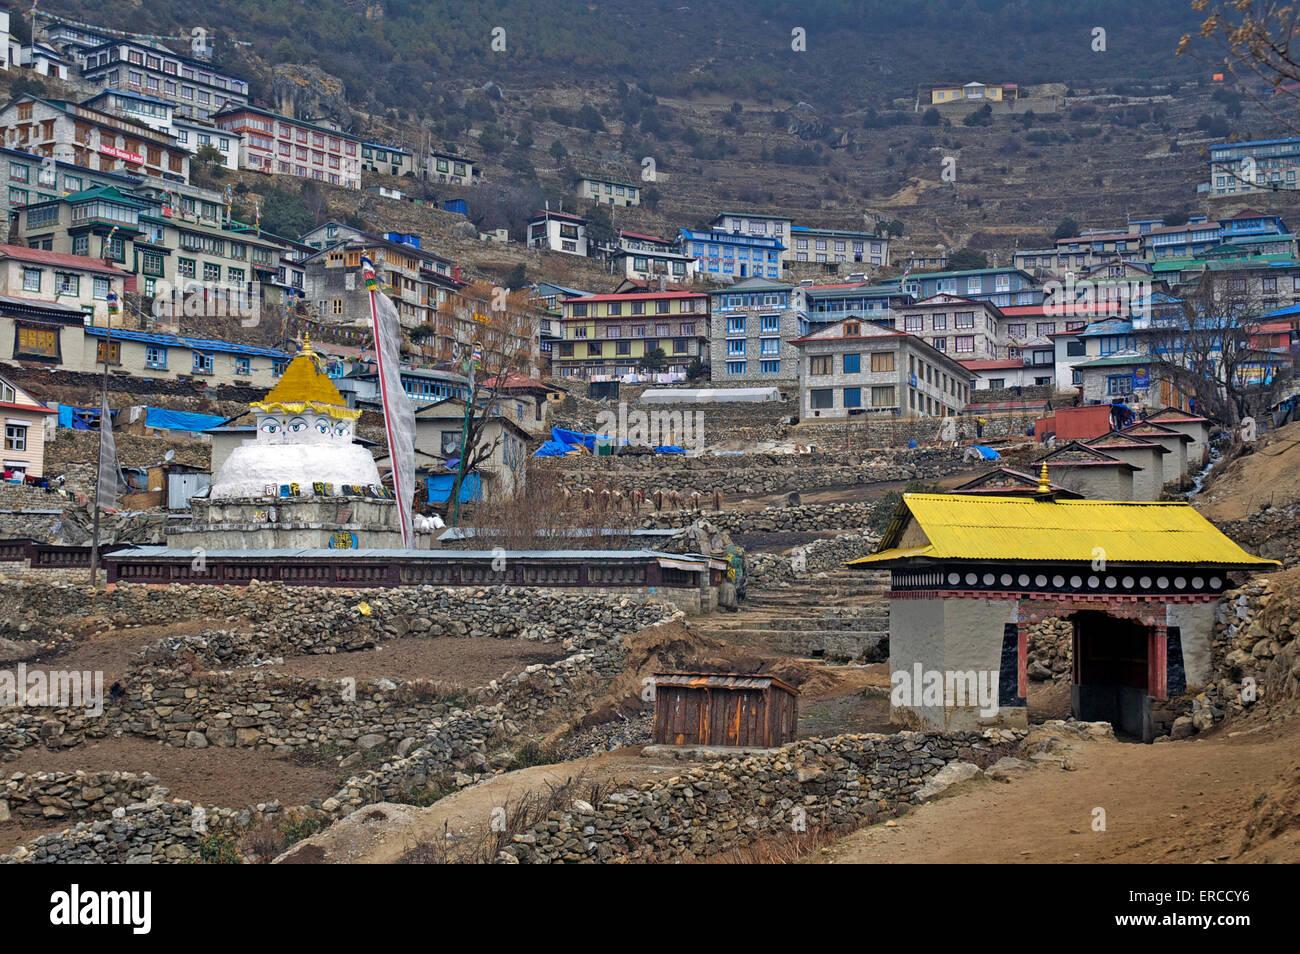 Namche Bazaar, Nepal. - Stock Image